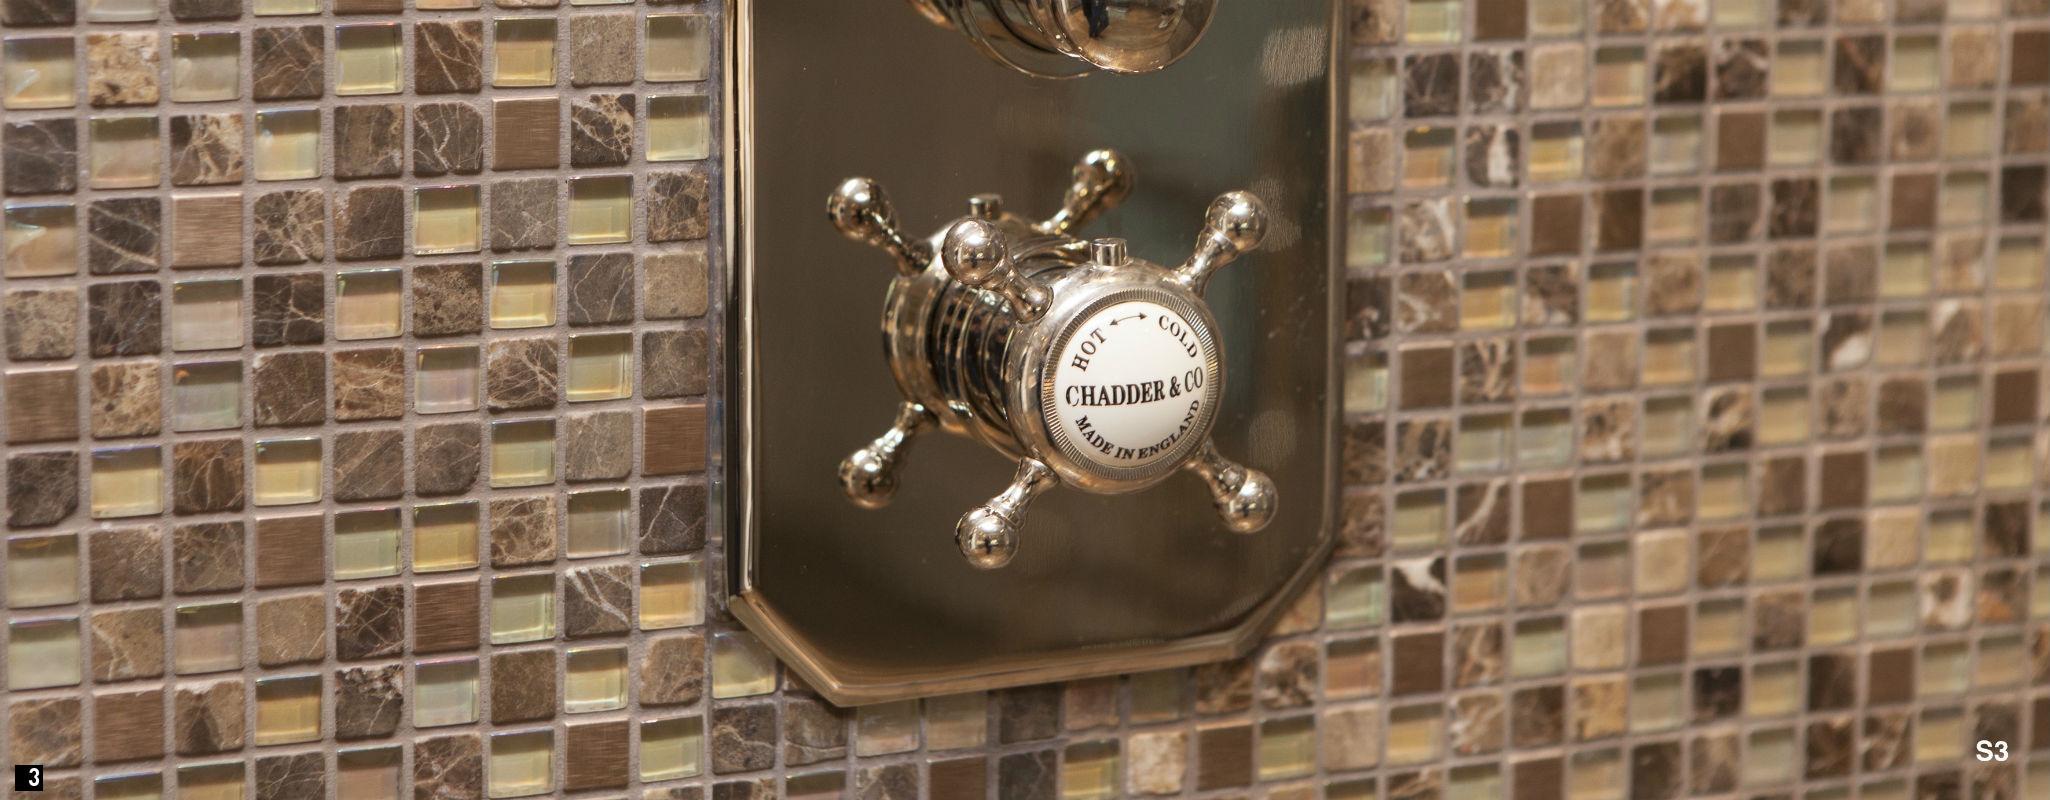 Nickel Vintage Shower, Thermostatic Traditional Shower ,Chadder Shower Valve Nickel Finish